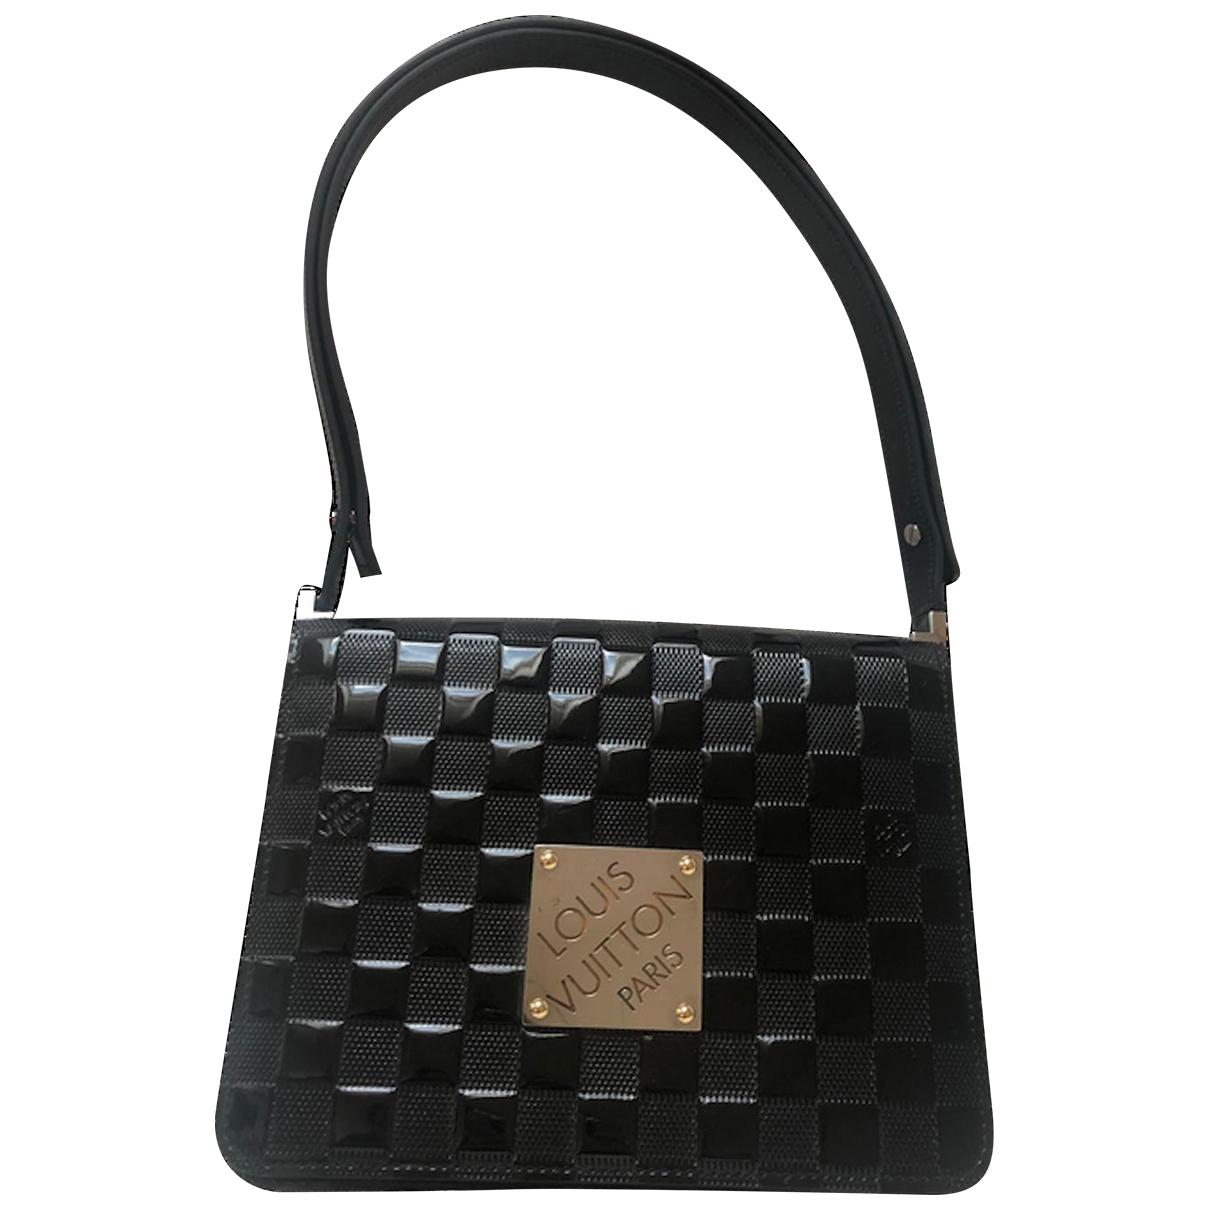 Bolso  Cabaret  de Charol Louis Vuitton